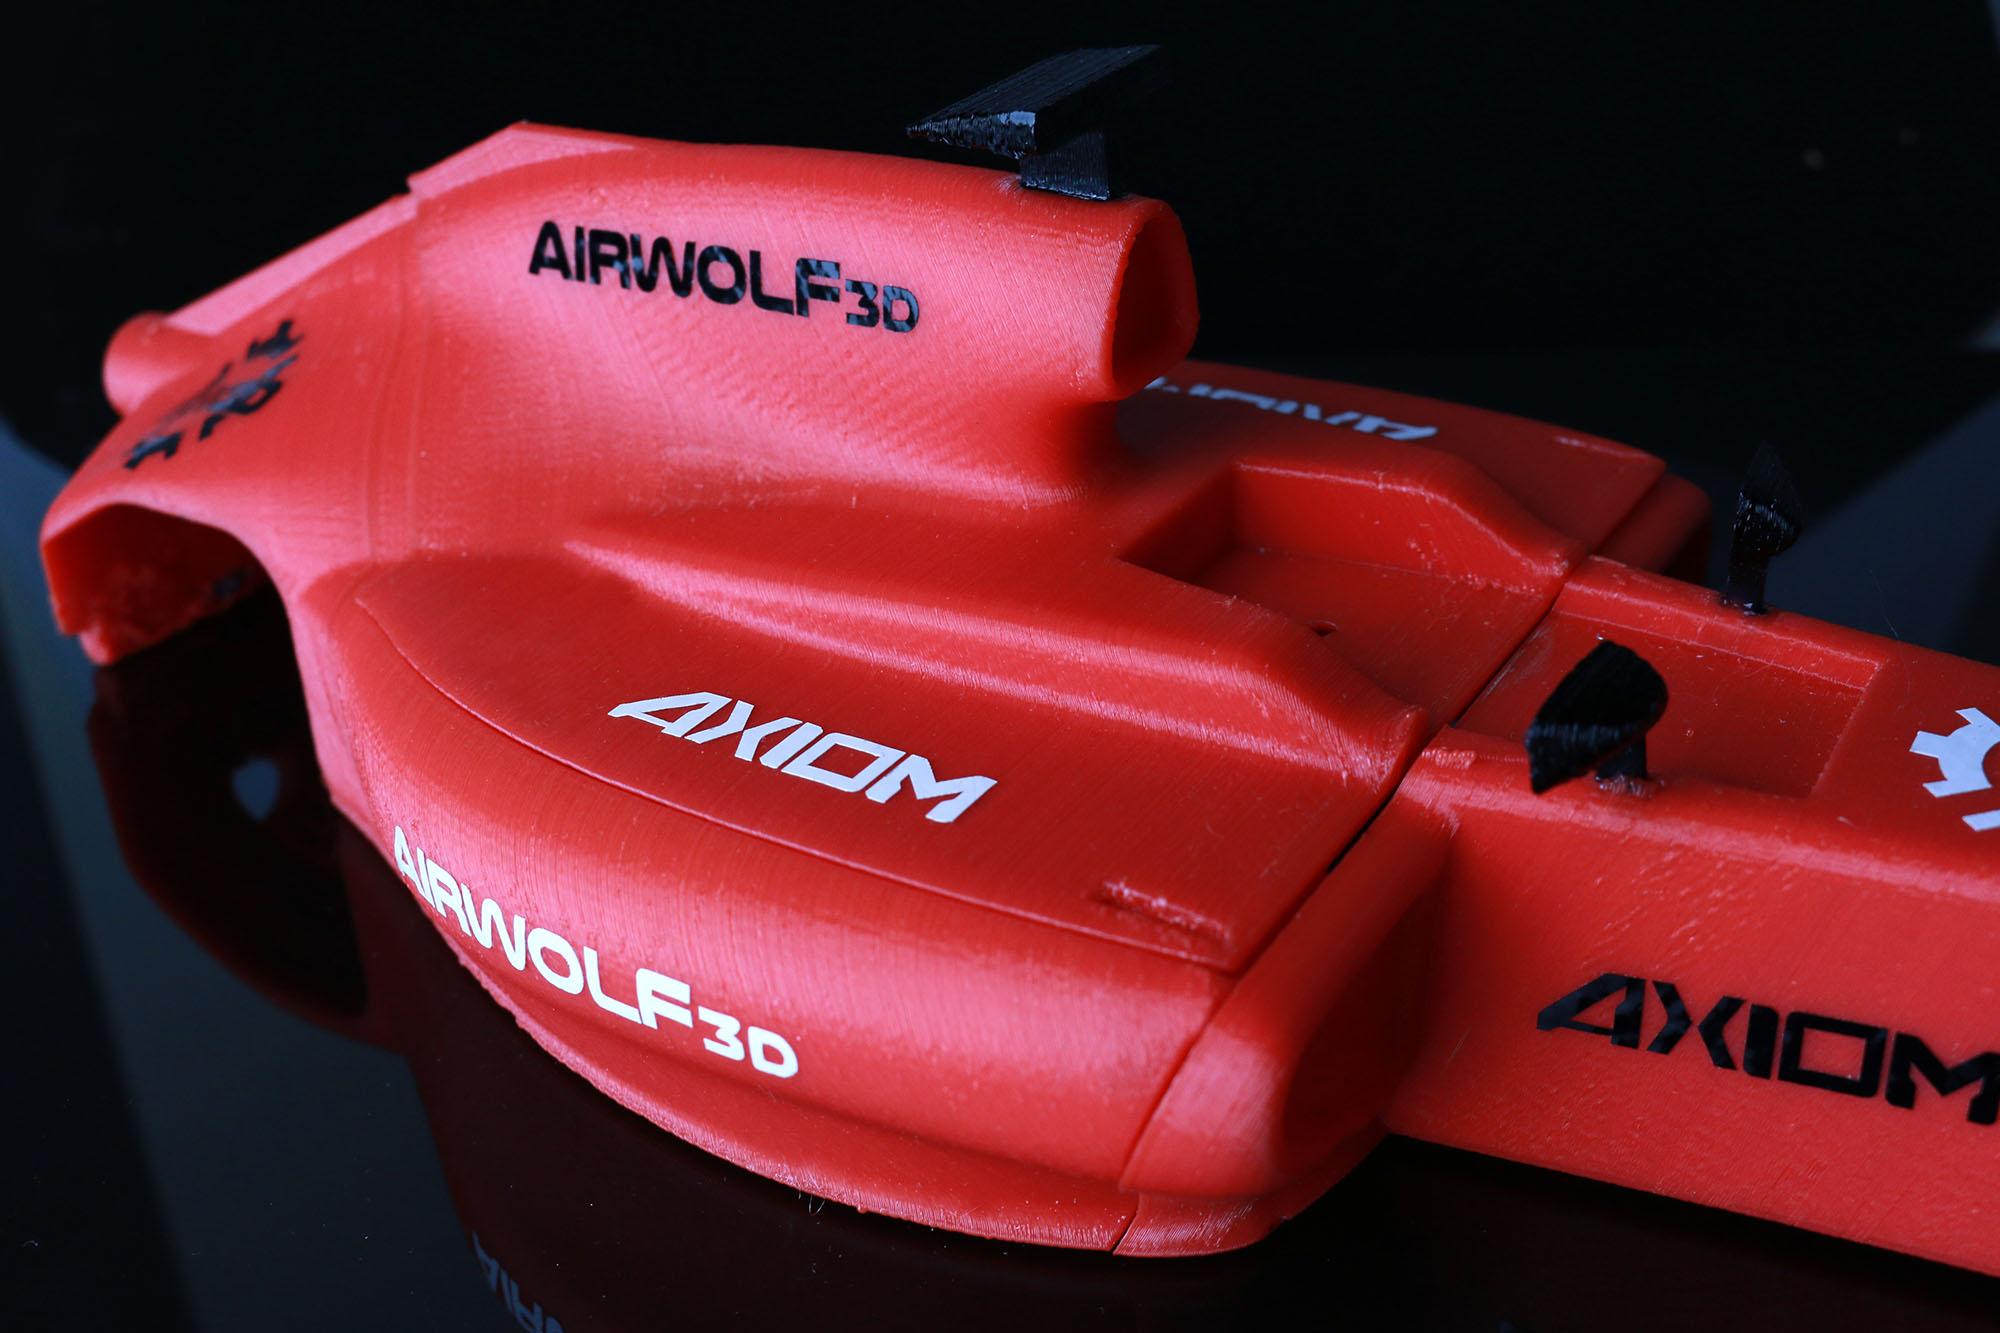 3D Printed F1 RC Car - Airwolf 3D Printers